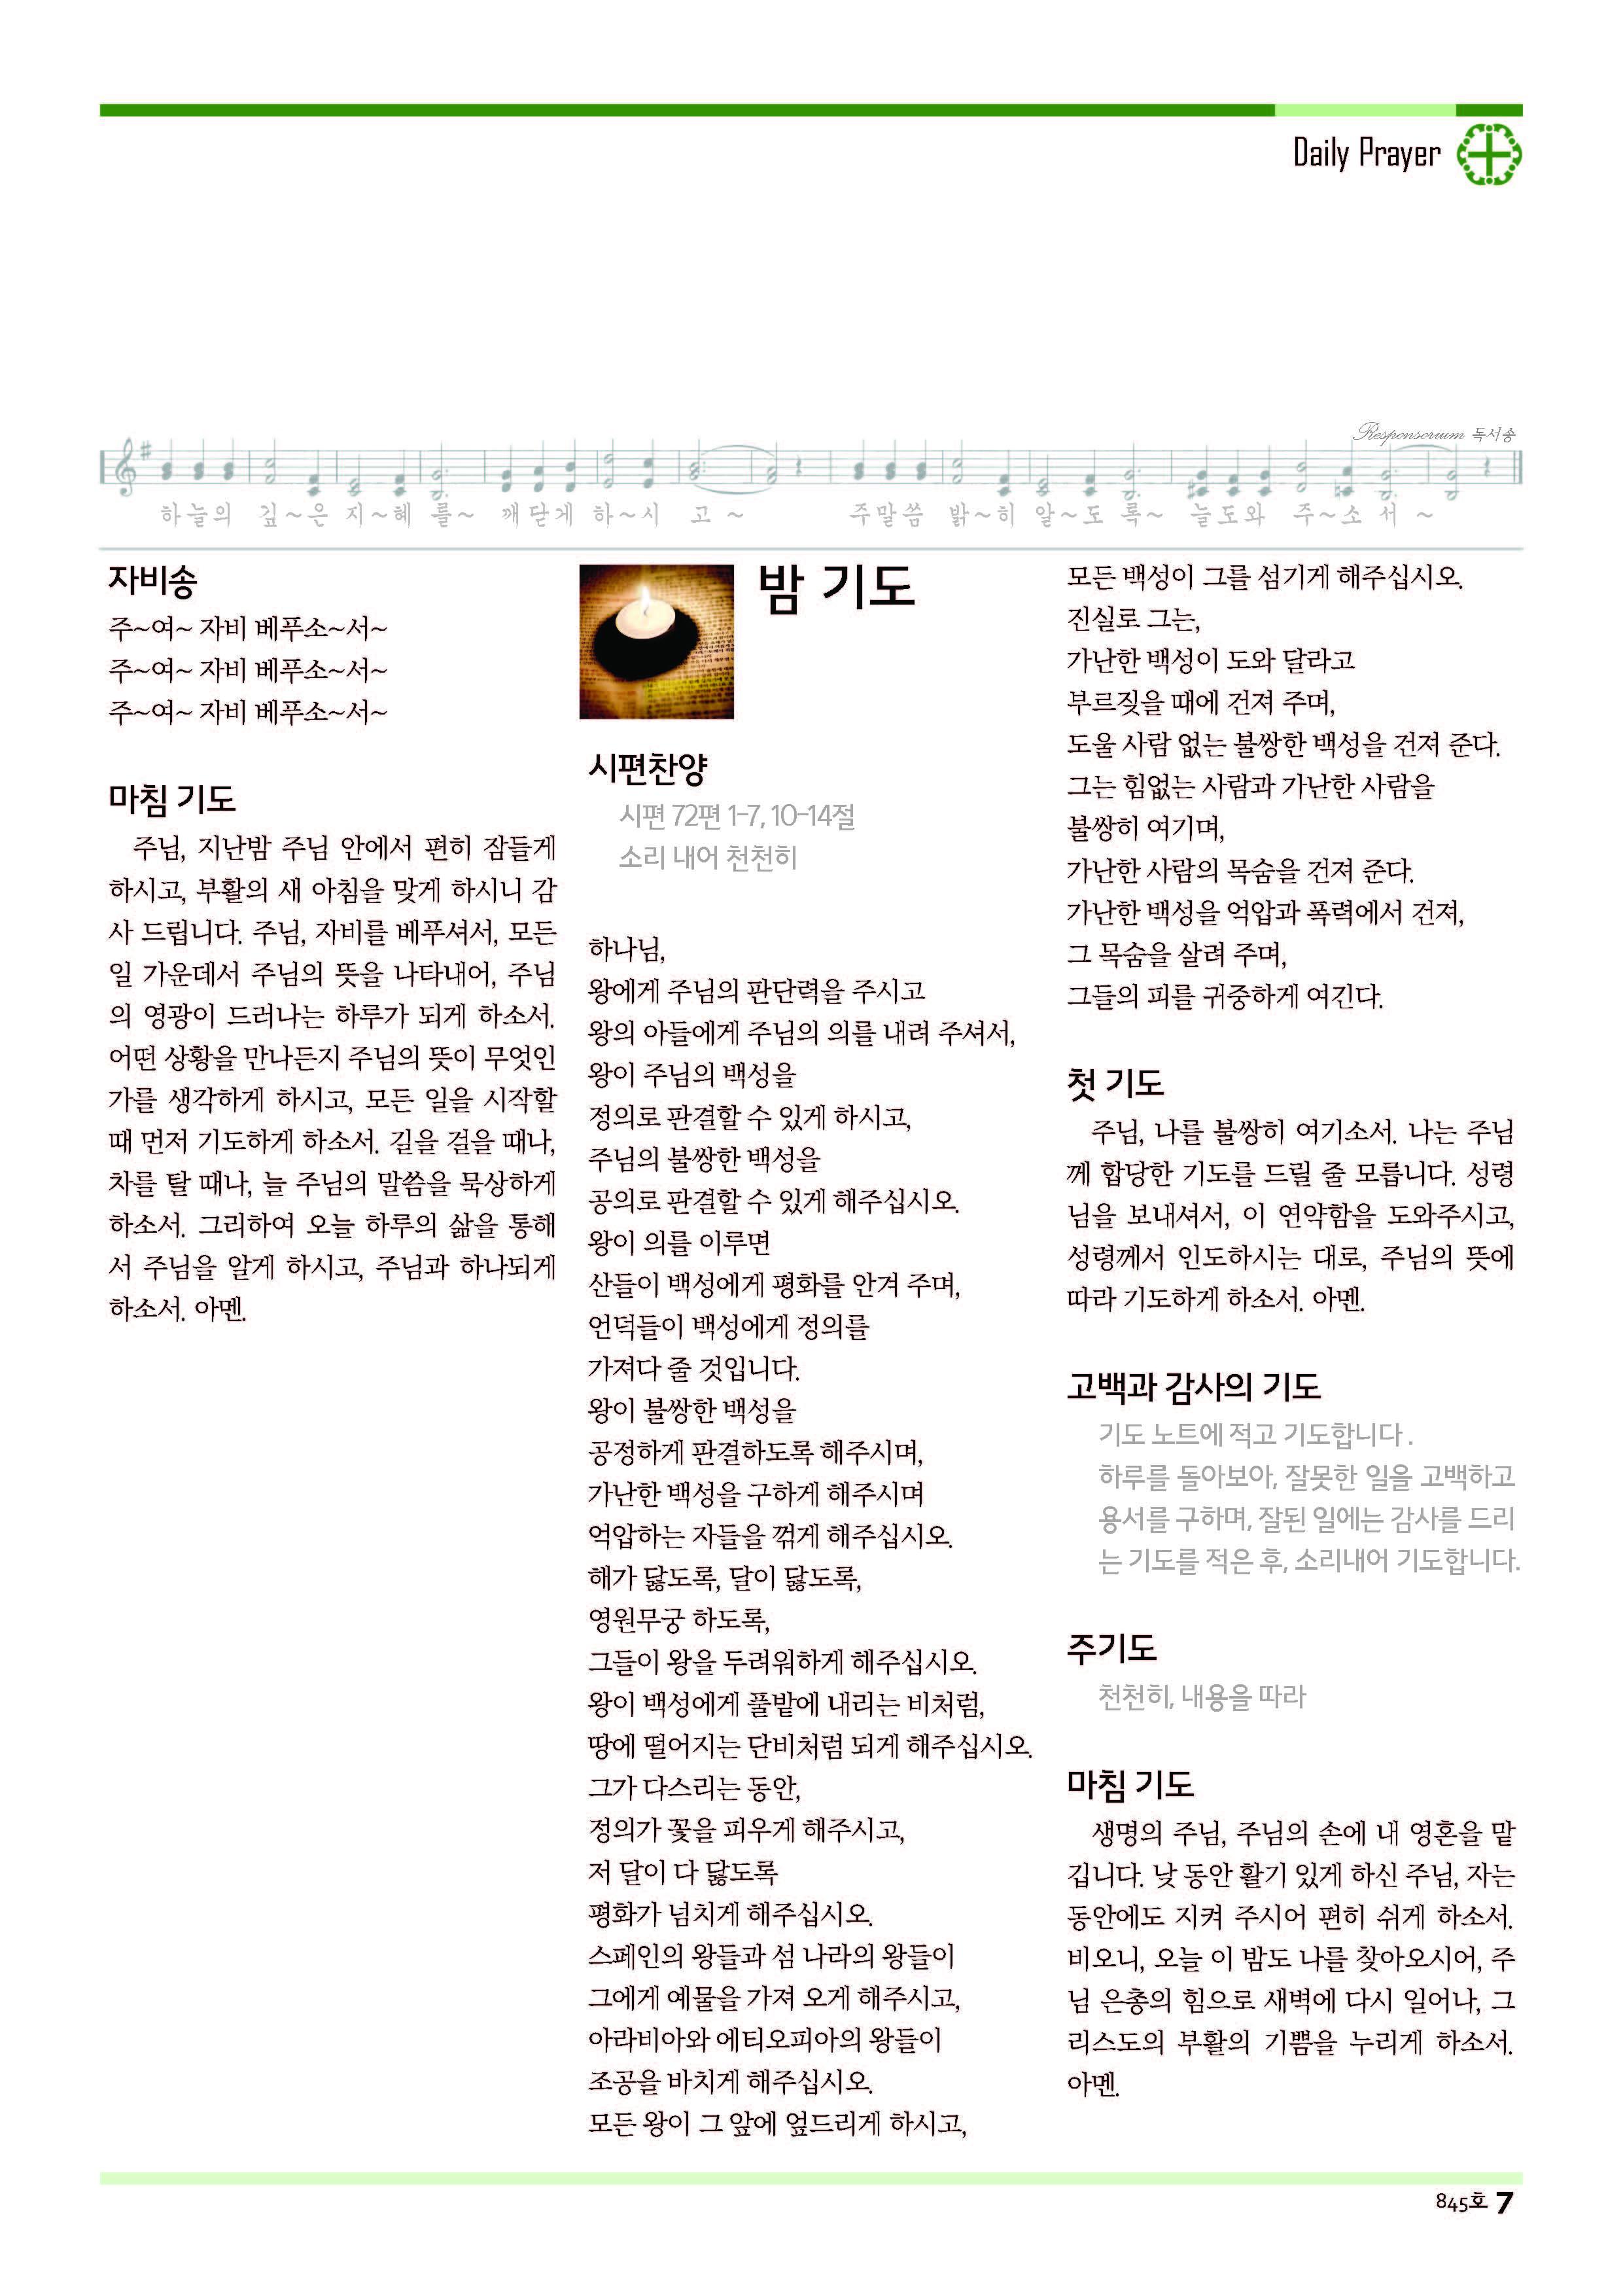 14sdjb0112_페이지_07.jpg